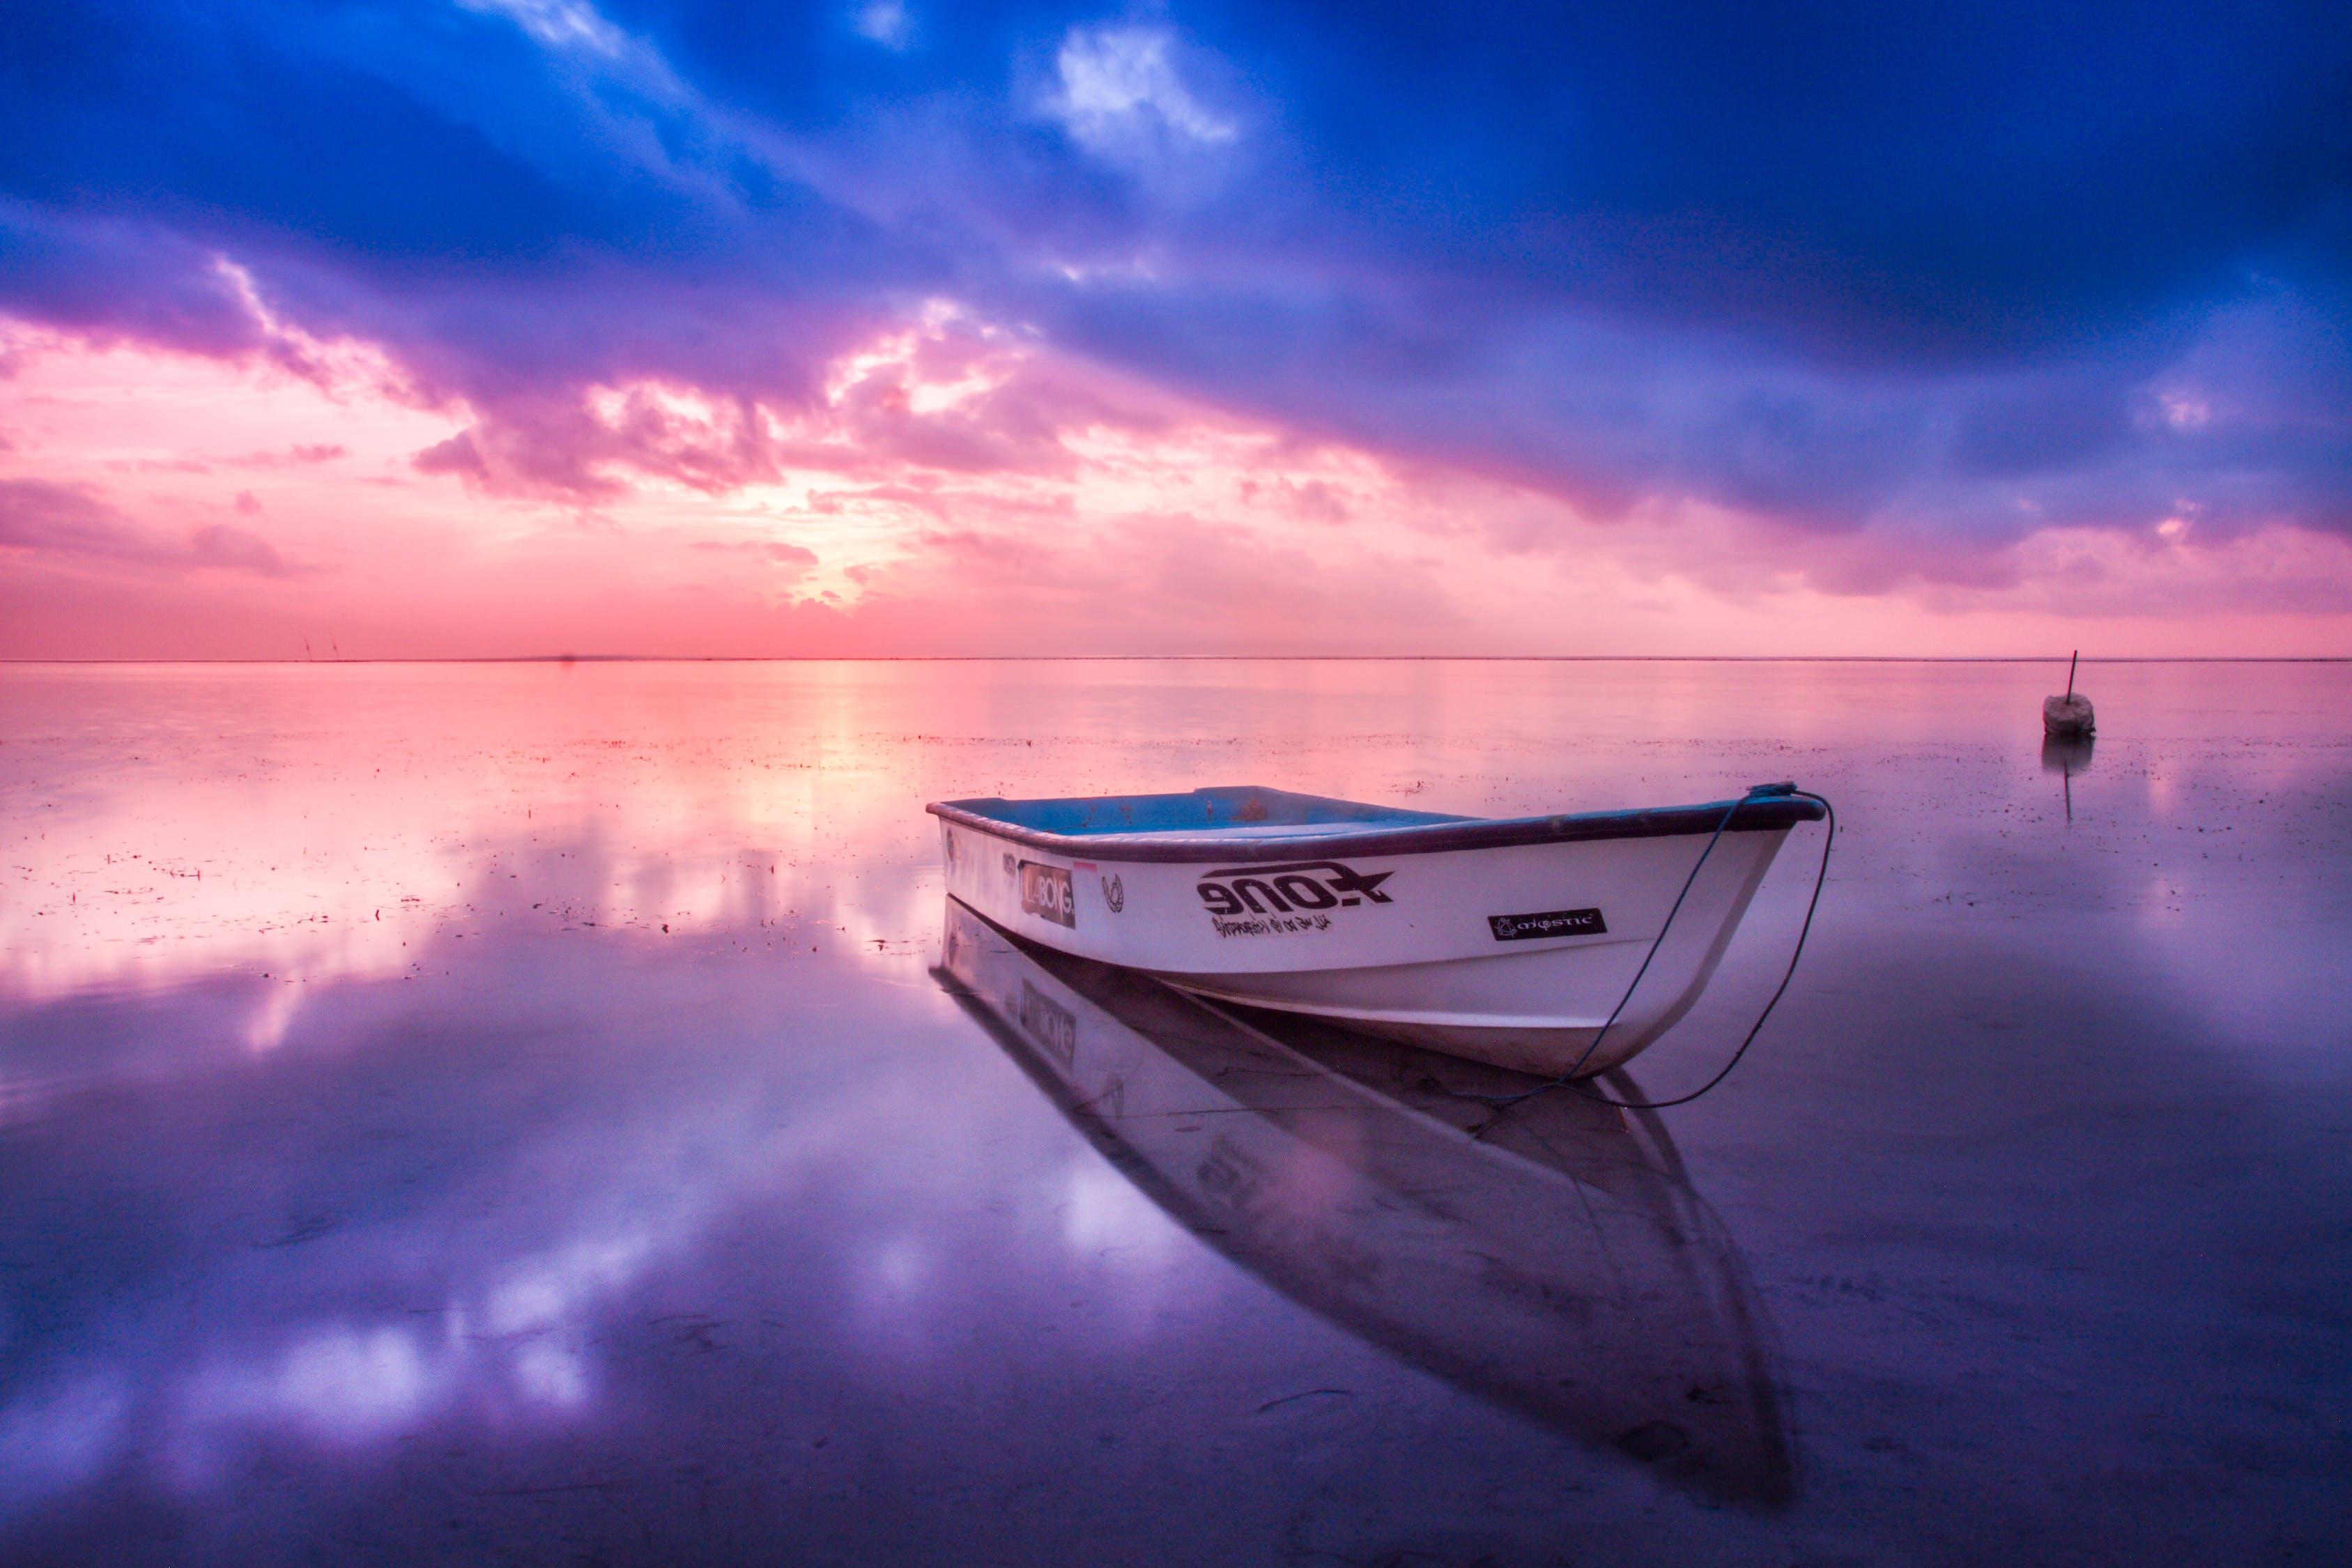 White Boat in Body of Water